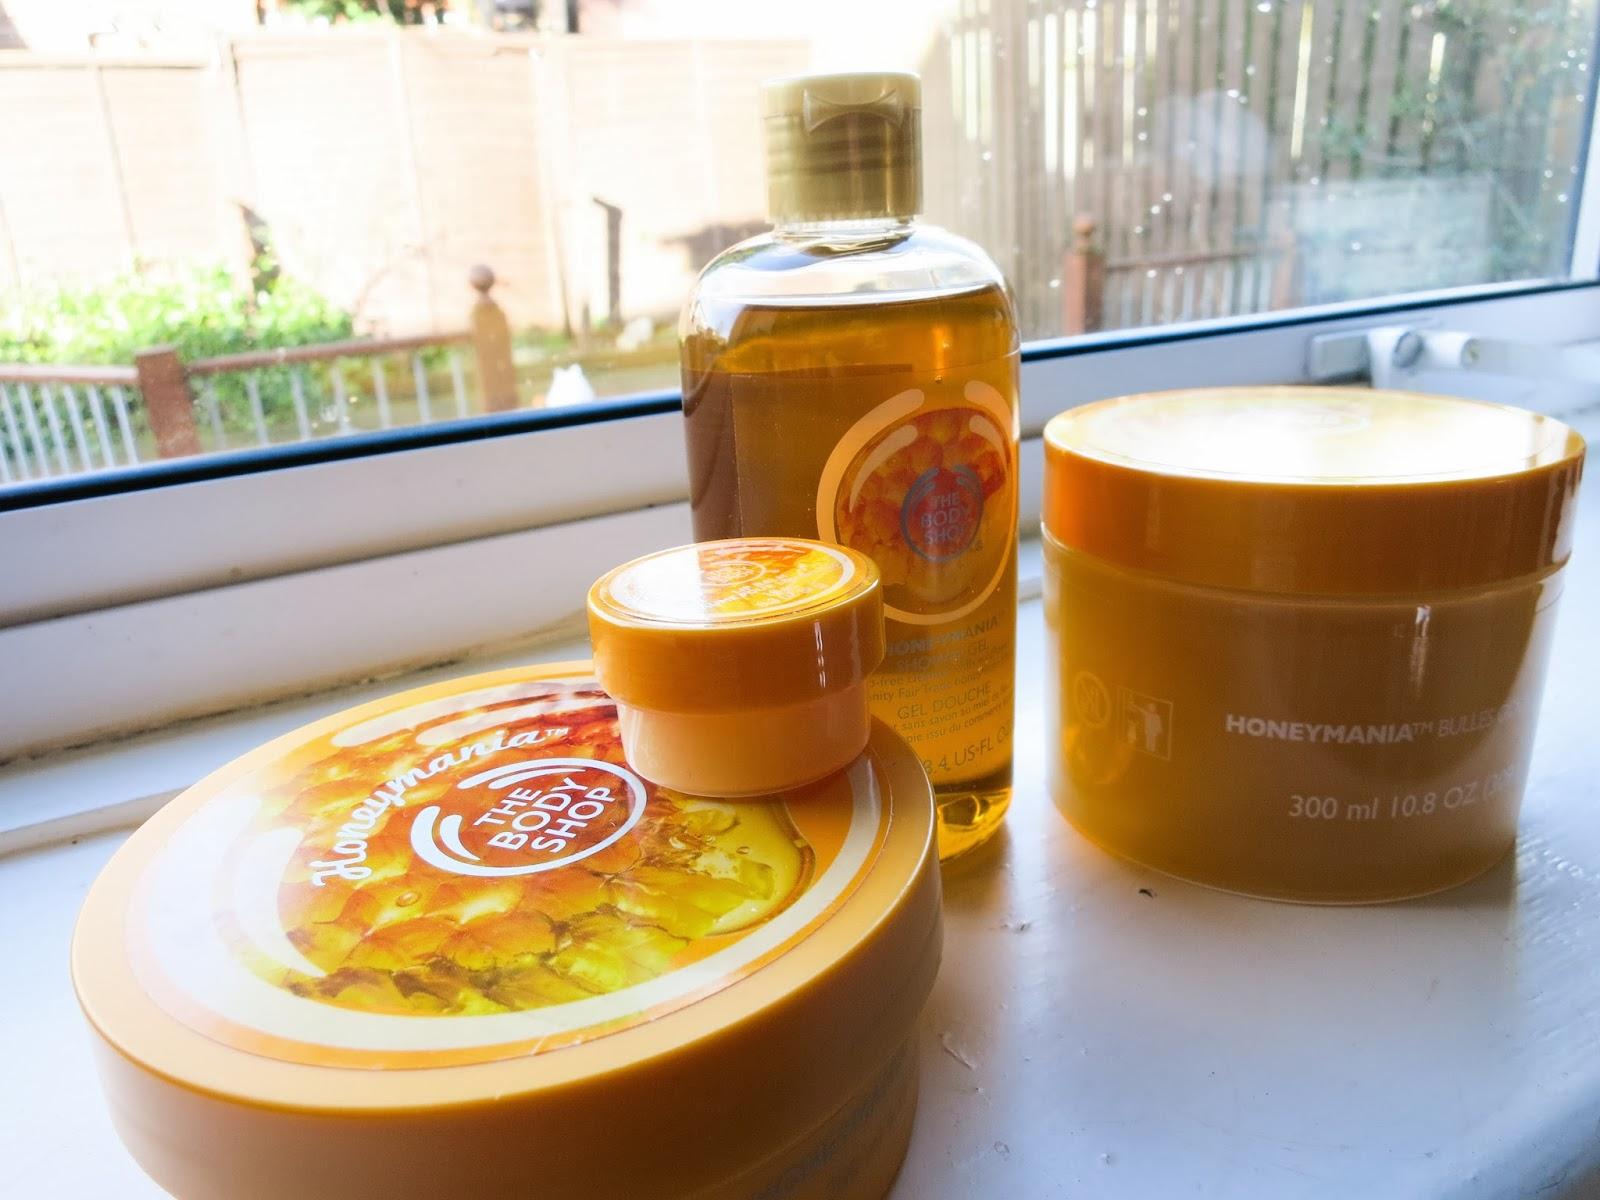 The Honeymania Range from The Body Shop